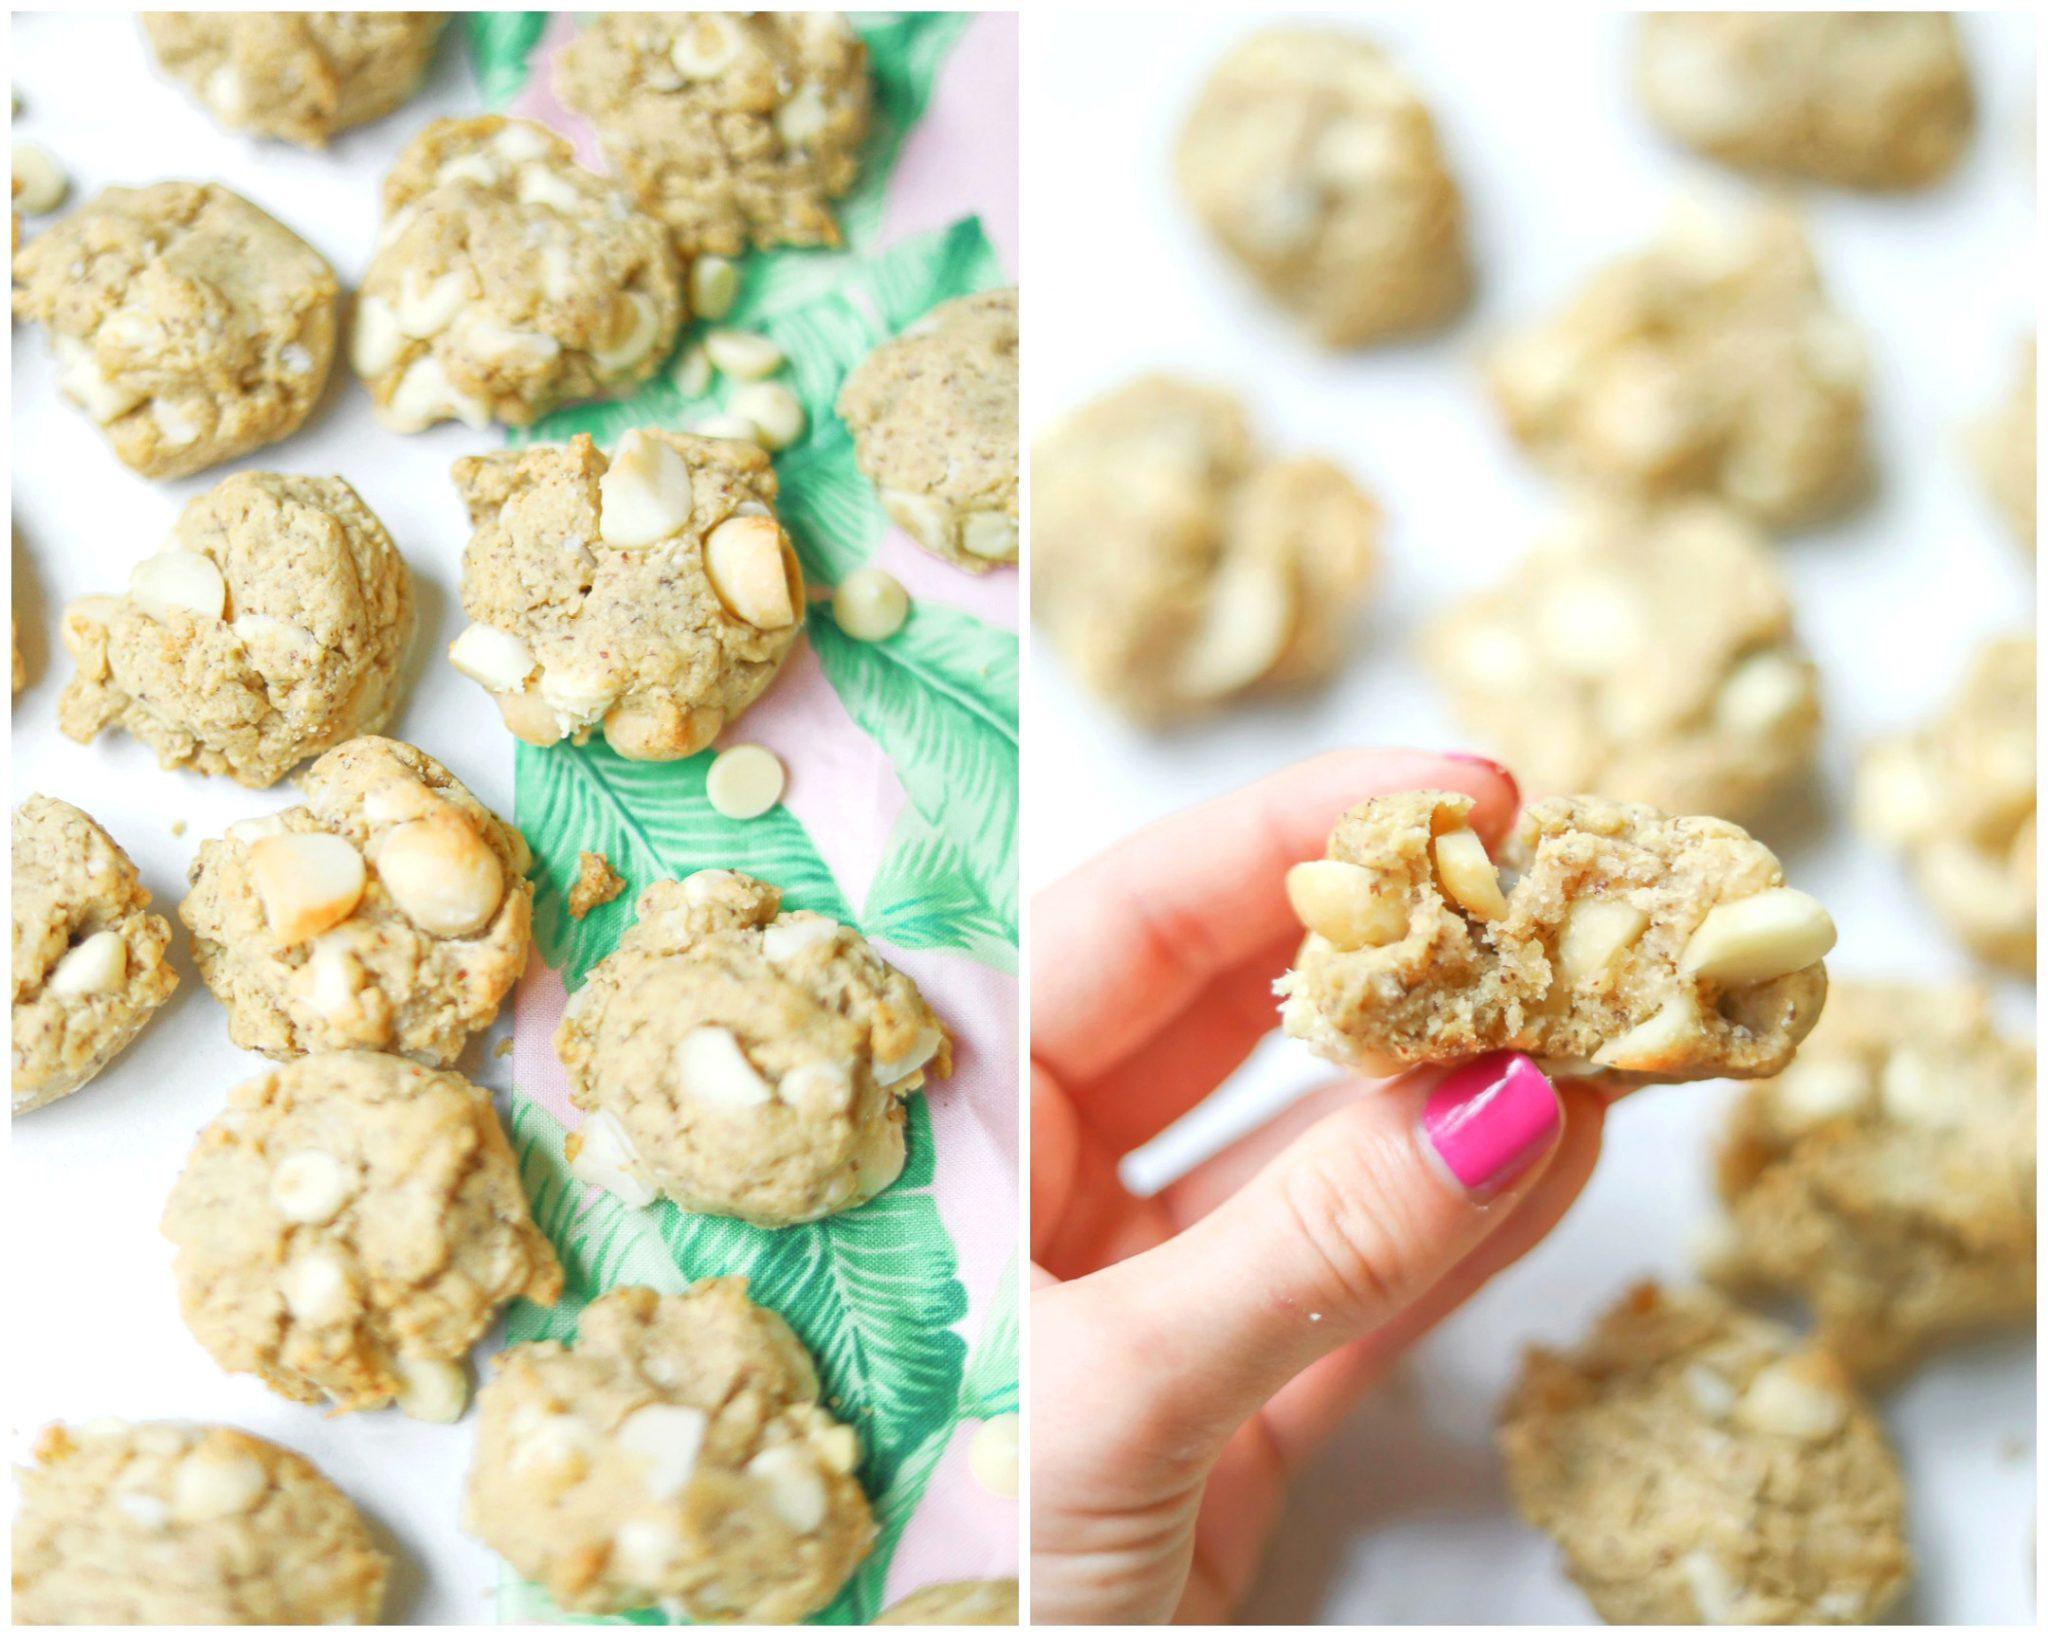 white chocolate chips gluten free dairy free lemon almond healthy vegan cookies dessert macadamia nuts white chocolate chips snacks